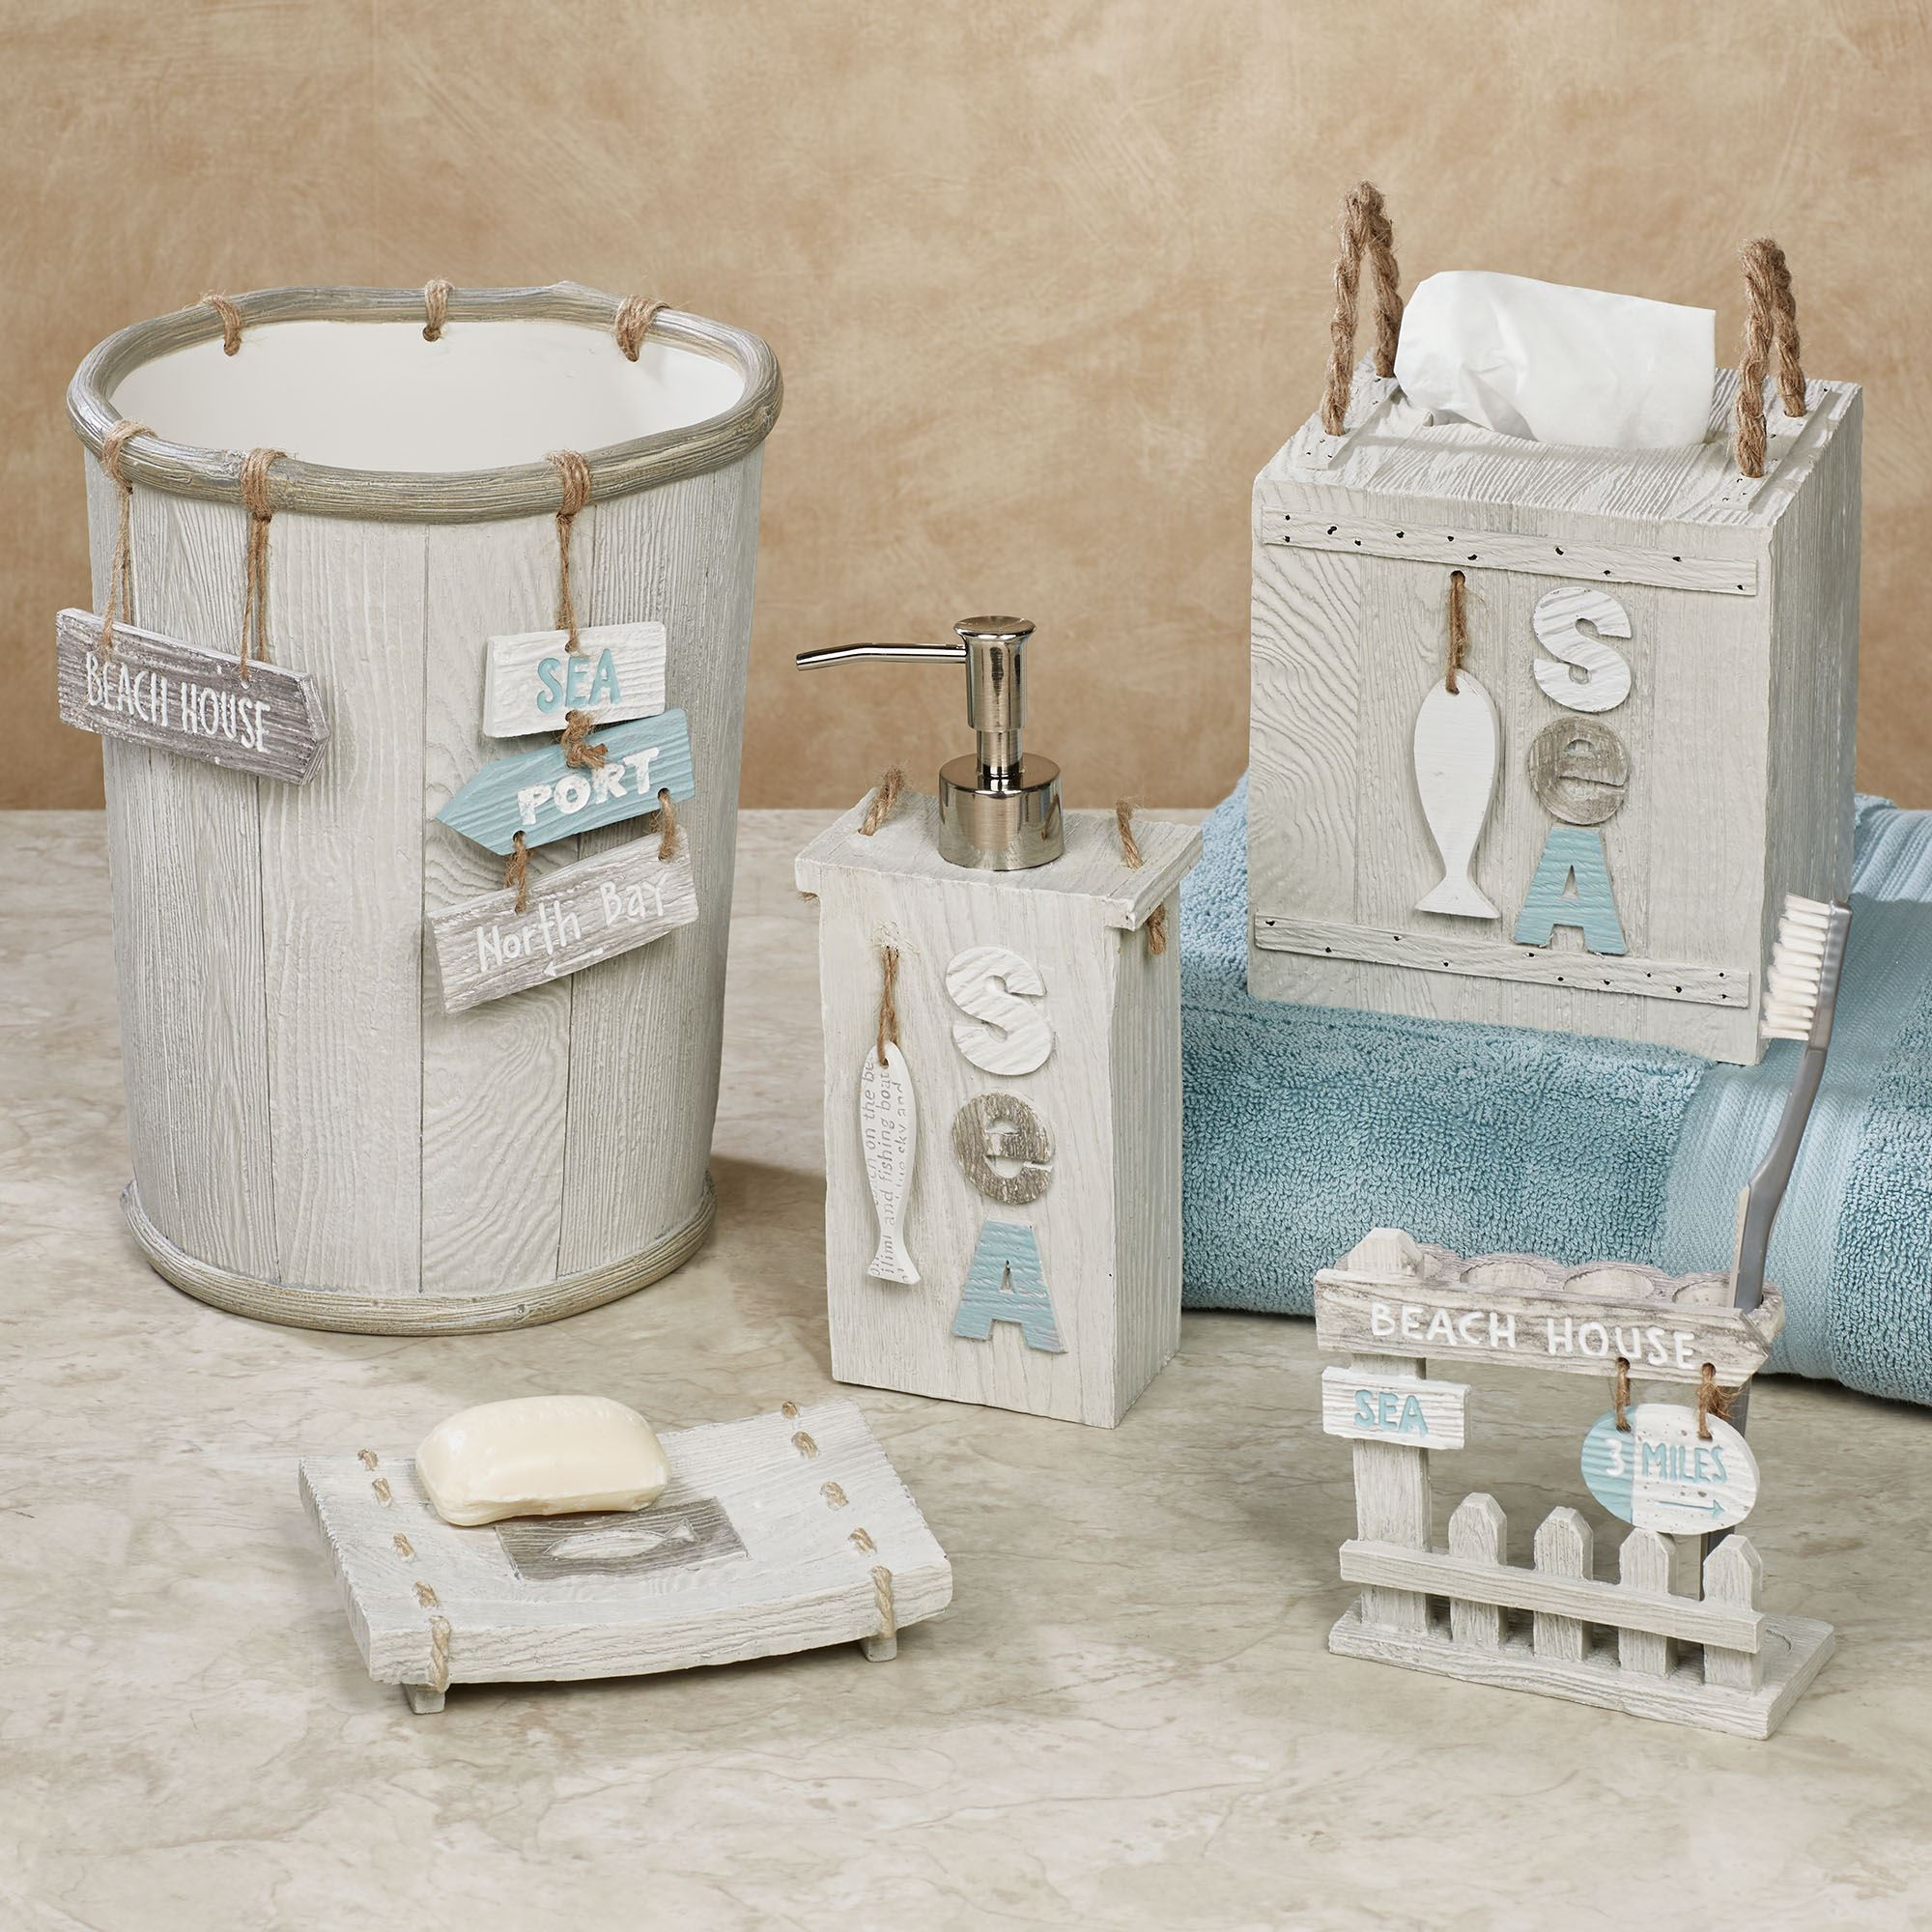 Driftwood Coastal Bath Accessories, Beach Bathroom Accessories